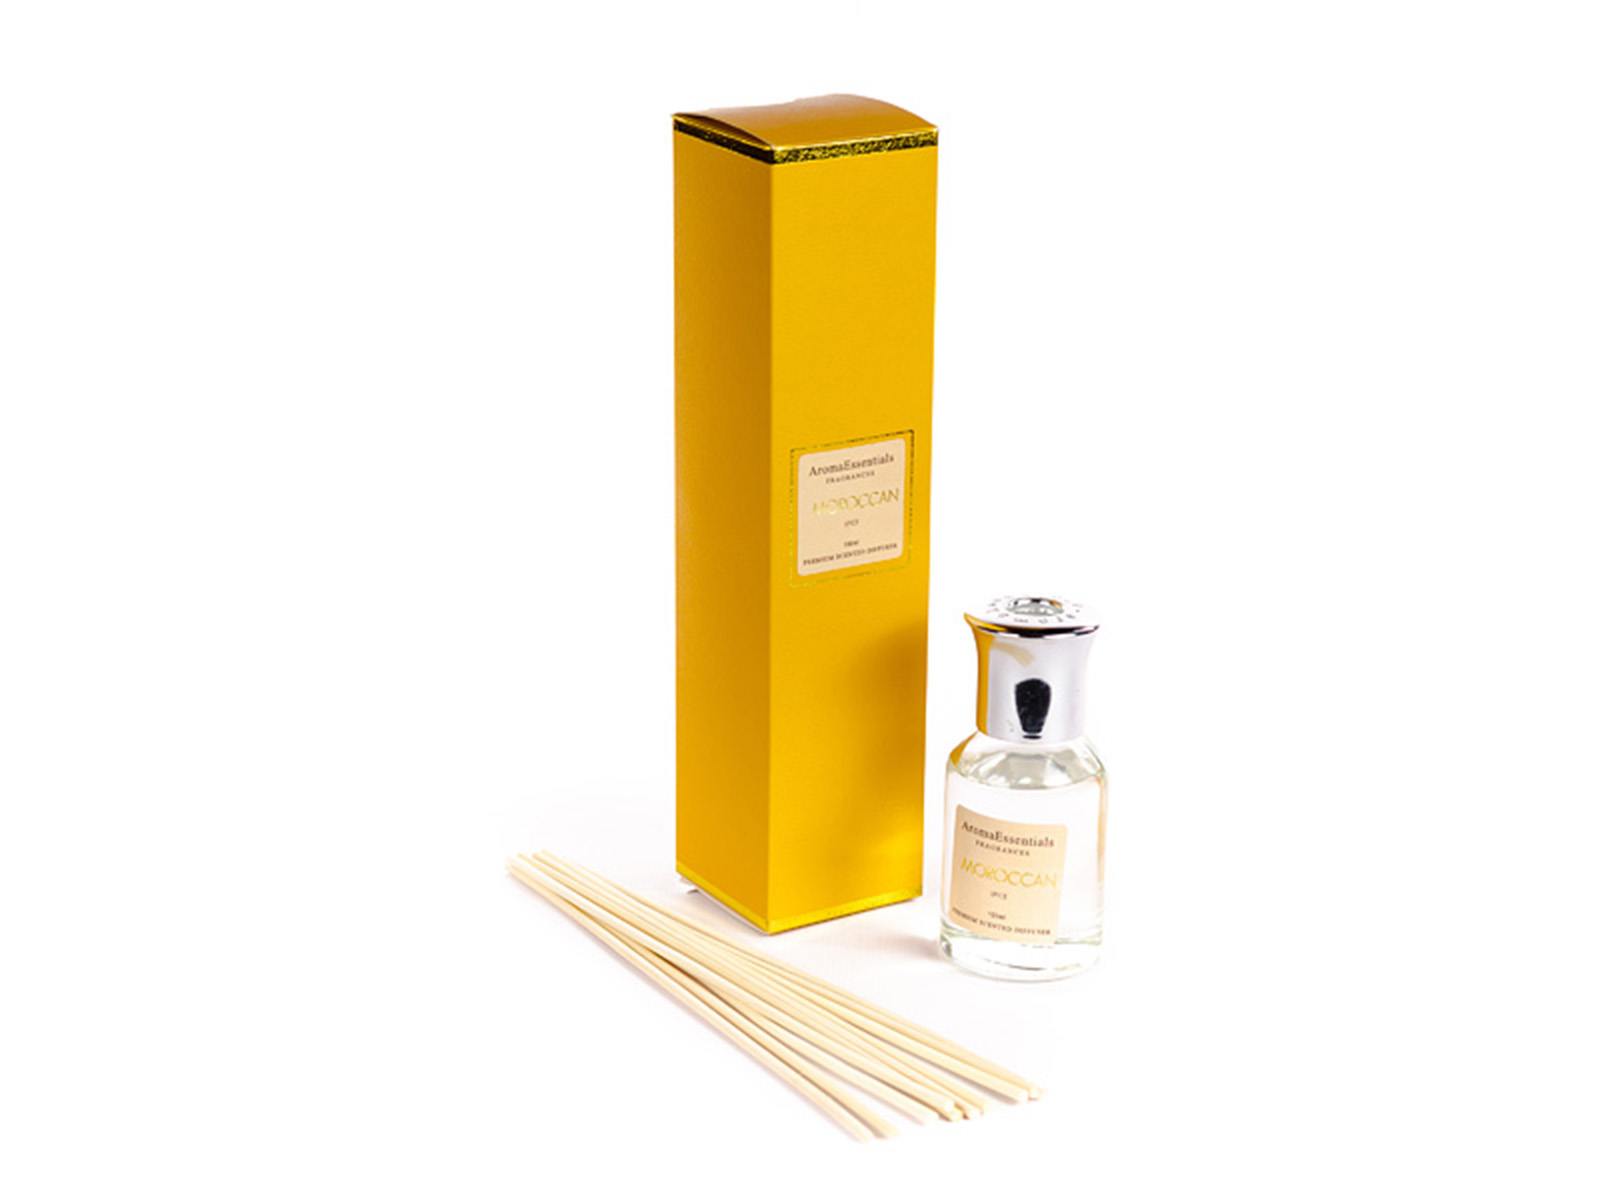 Диффузор SpicesАроматы для дома<br>Ароматический диффузор для дома. В комплект входит бутылочка с ароматной жидкостью и аромапалочки<br>